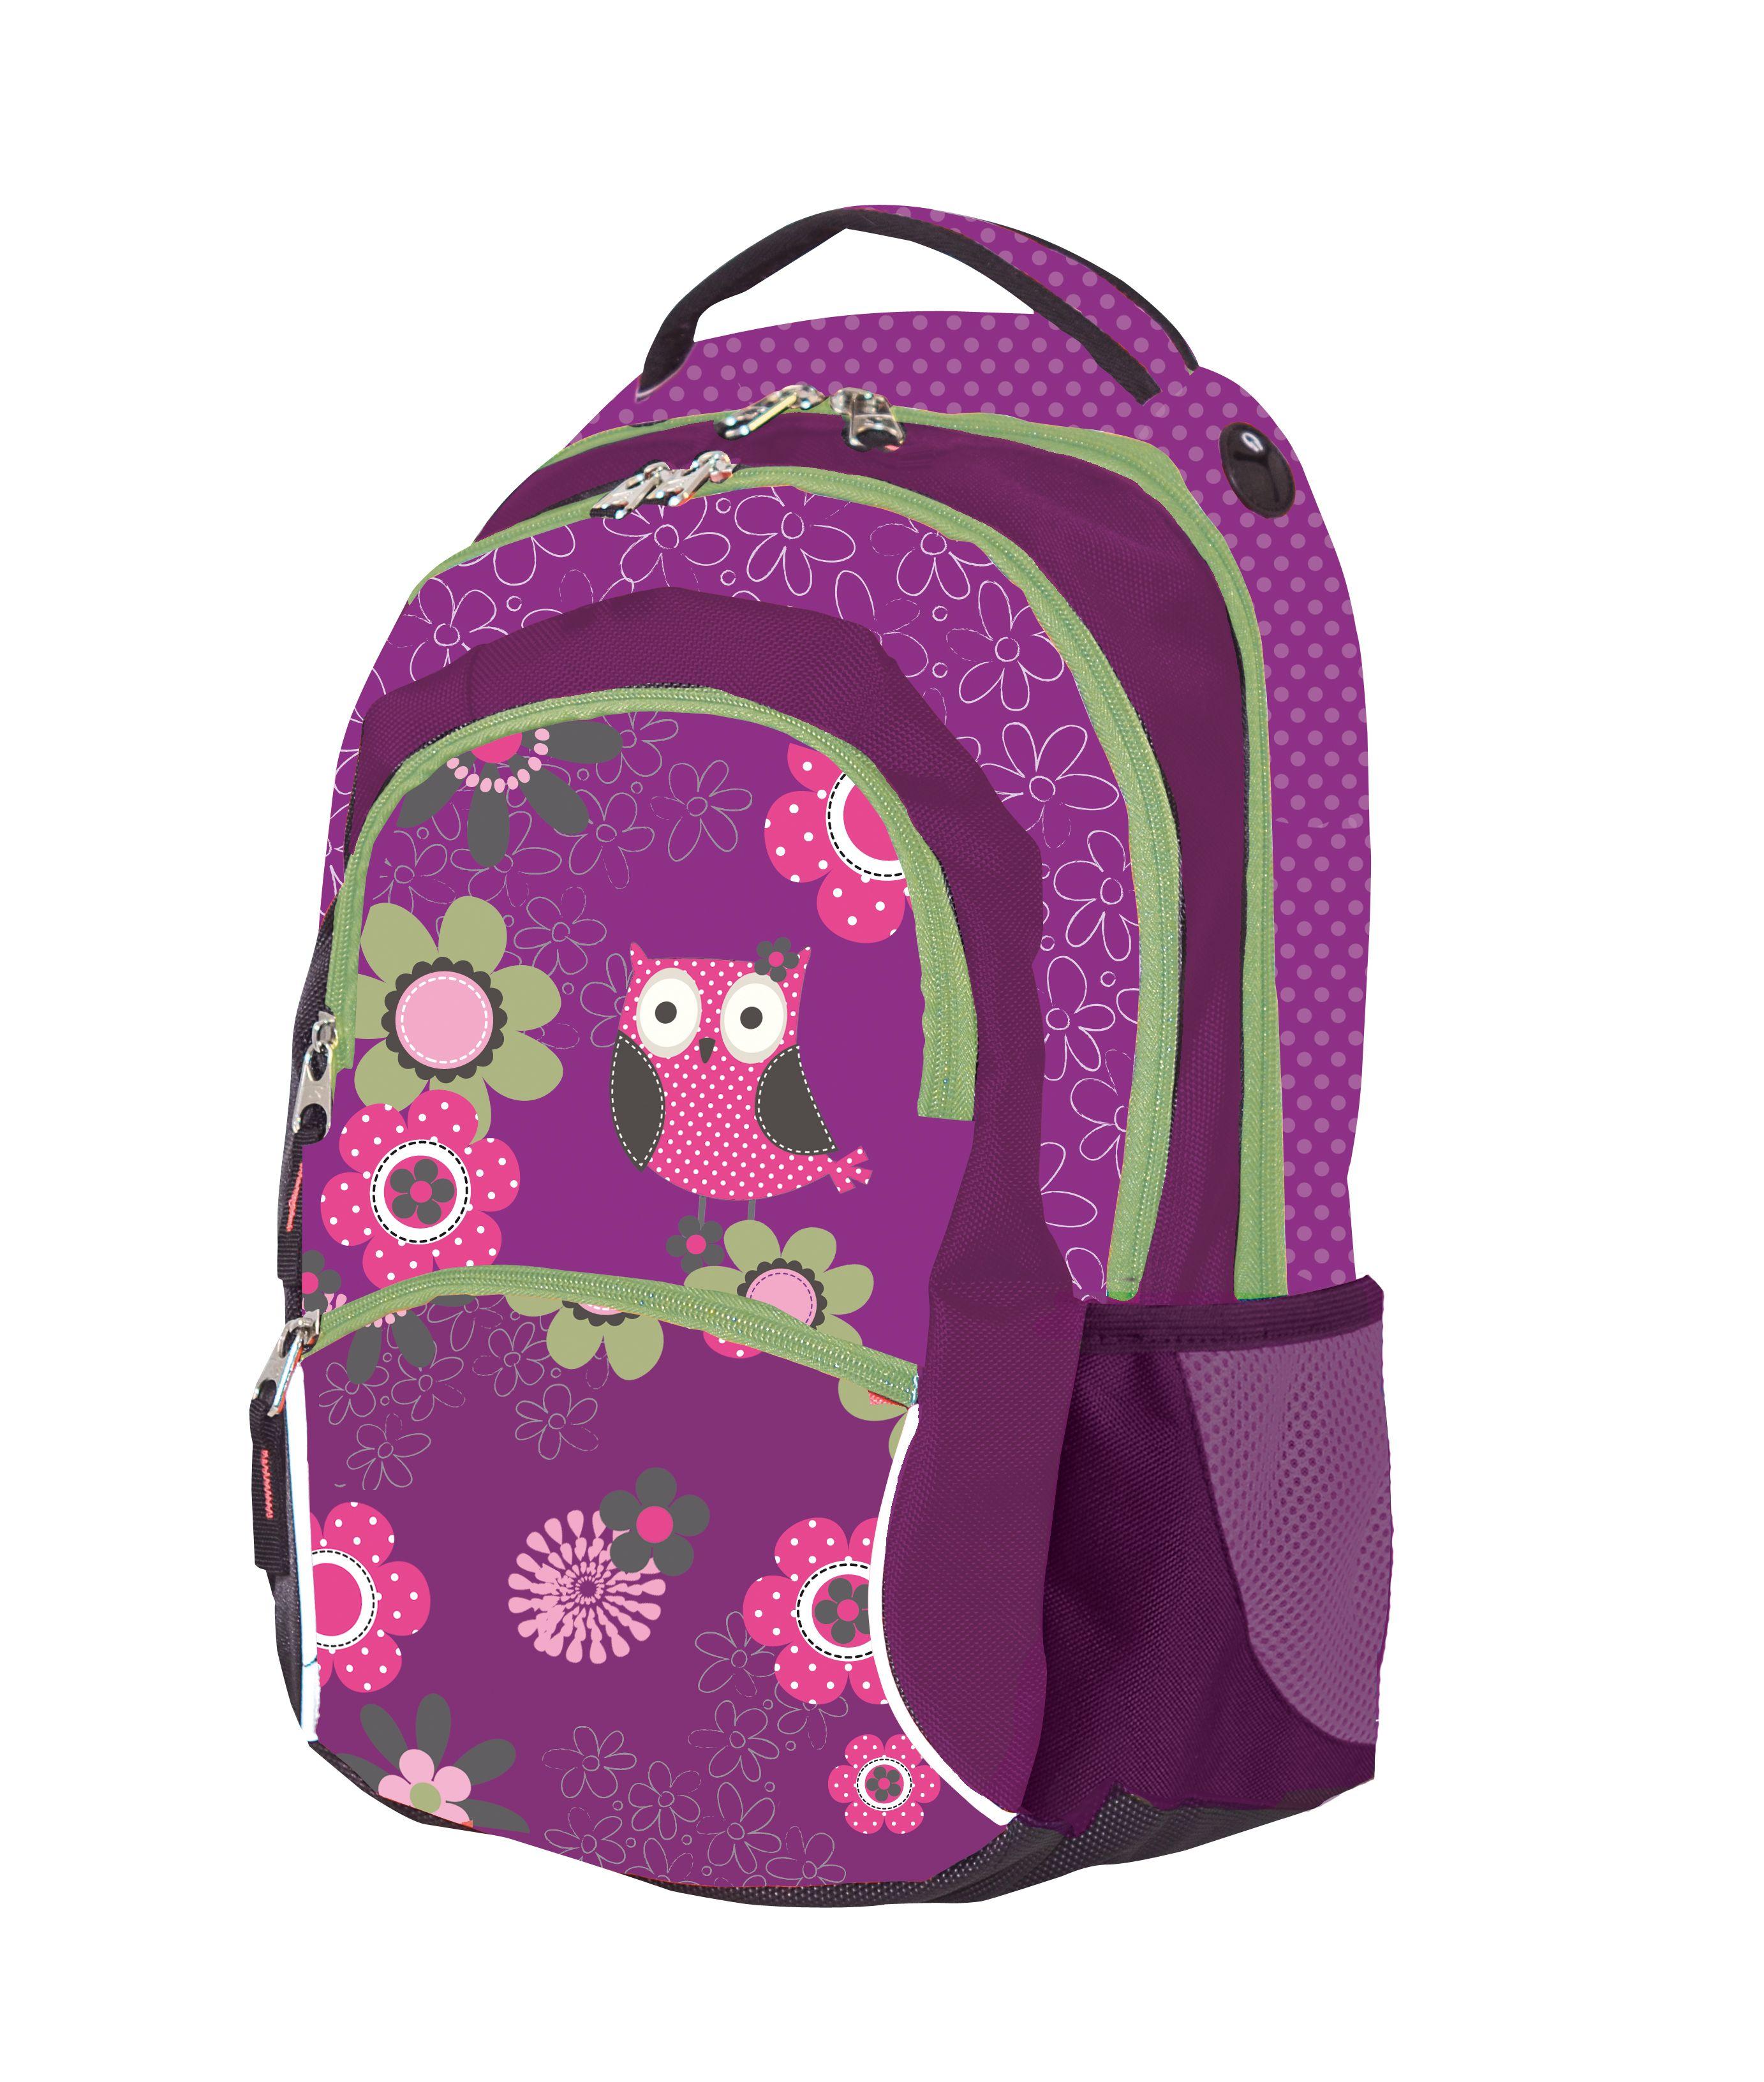 bb2007a0bae School Bag Owl  Školní batoh Owl